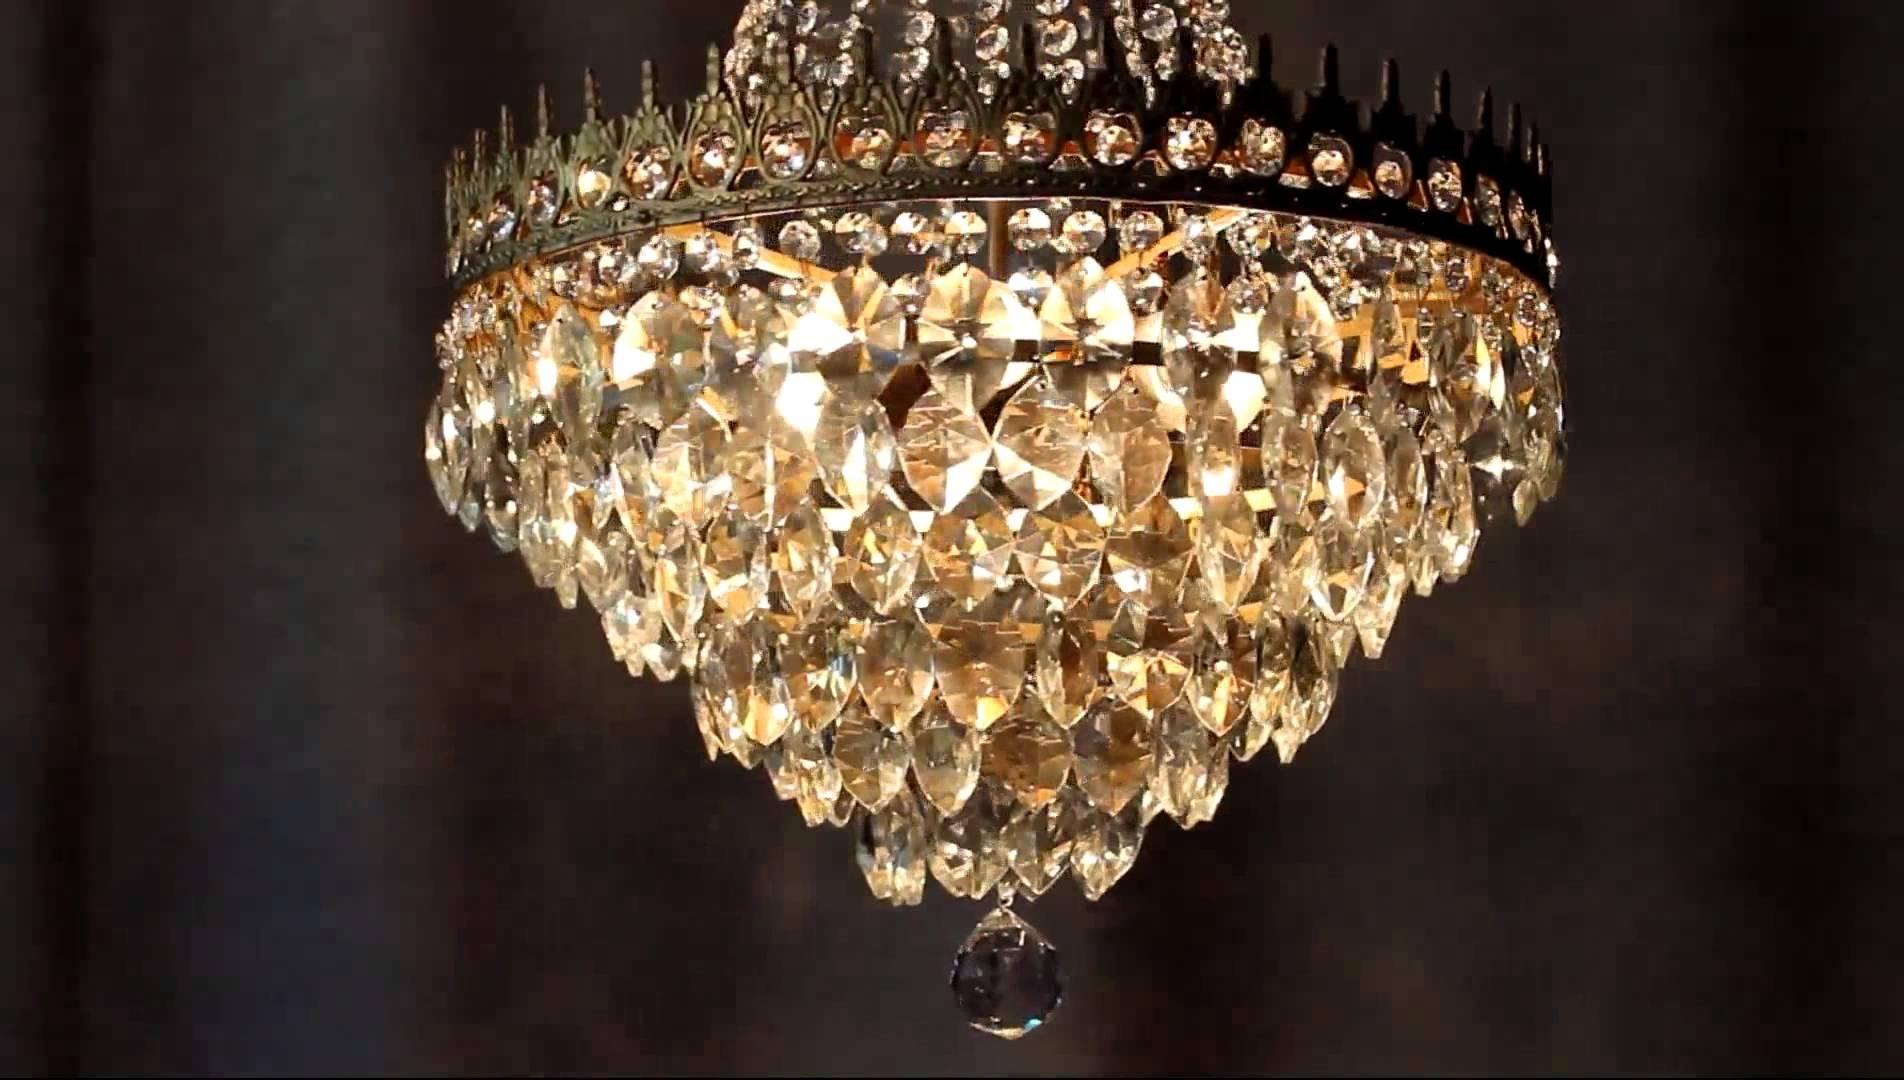 Huge Antique Luster Crystal Candelabra Chandelier Lighting Brass Old For Well Known Huge Crystal Chandelier (View 3 of 15)